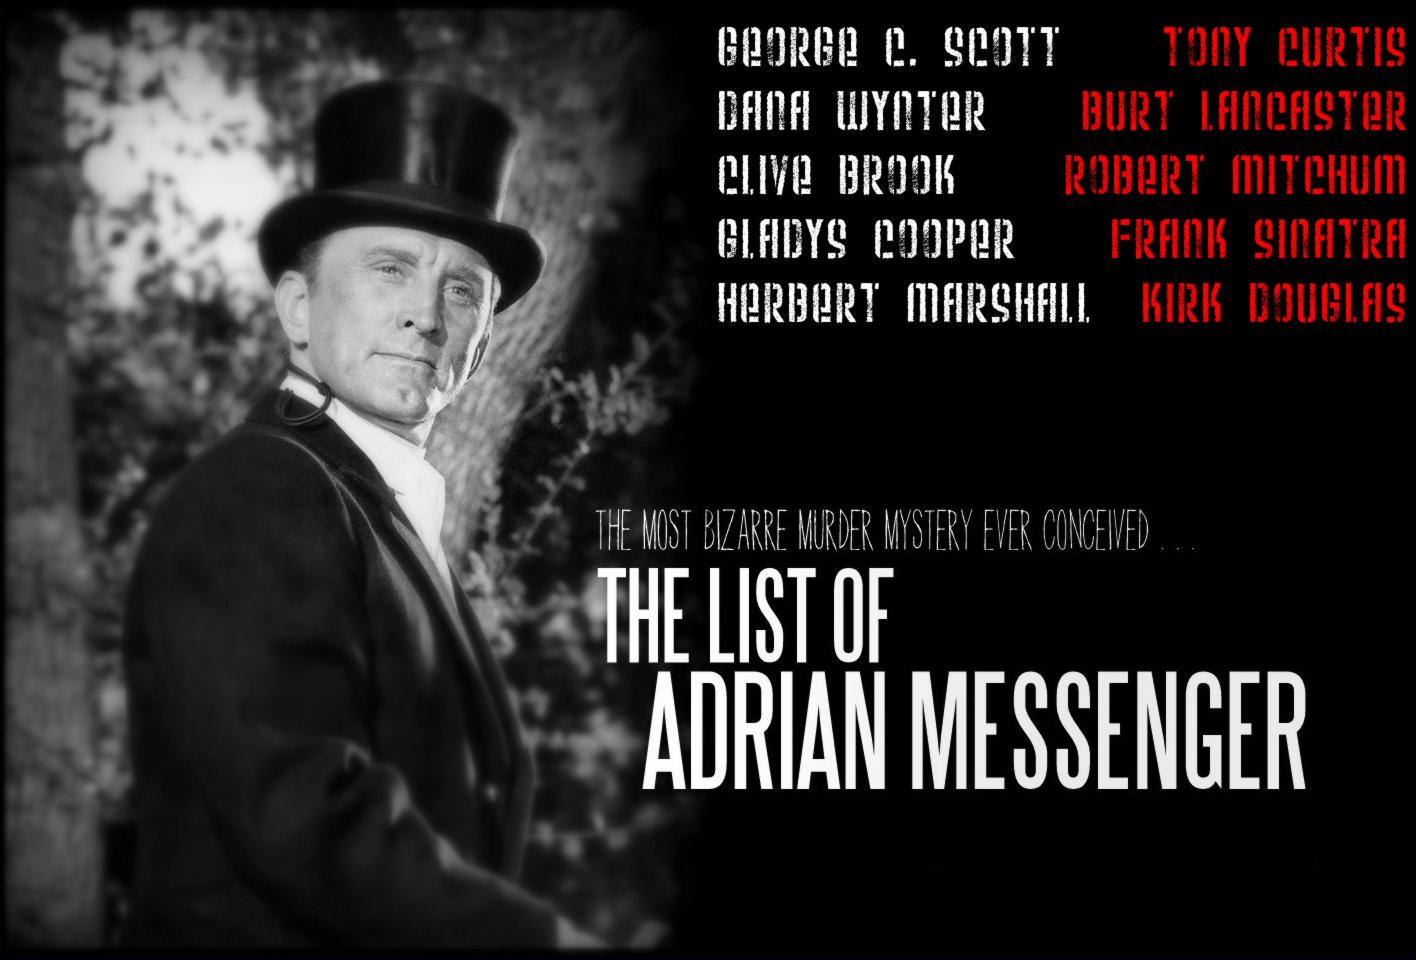 La lista de Adrián Messenger